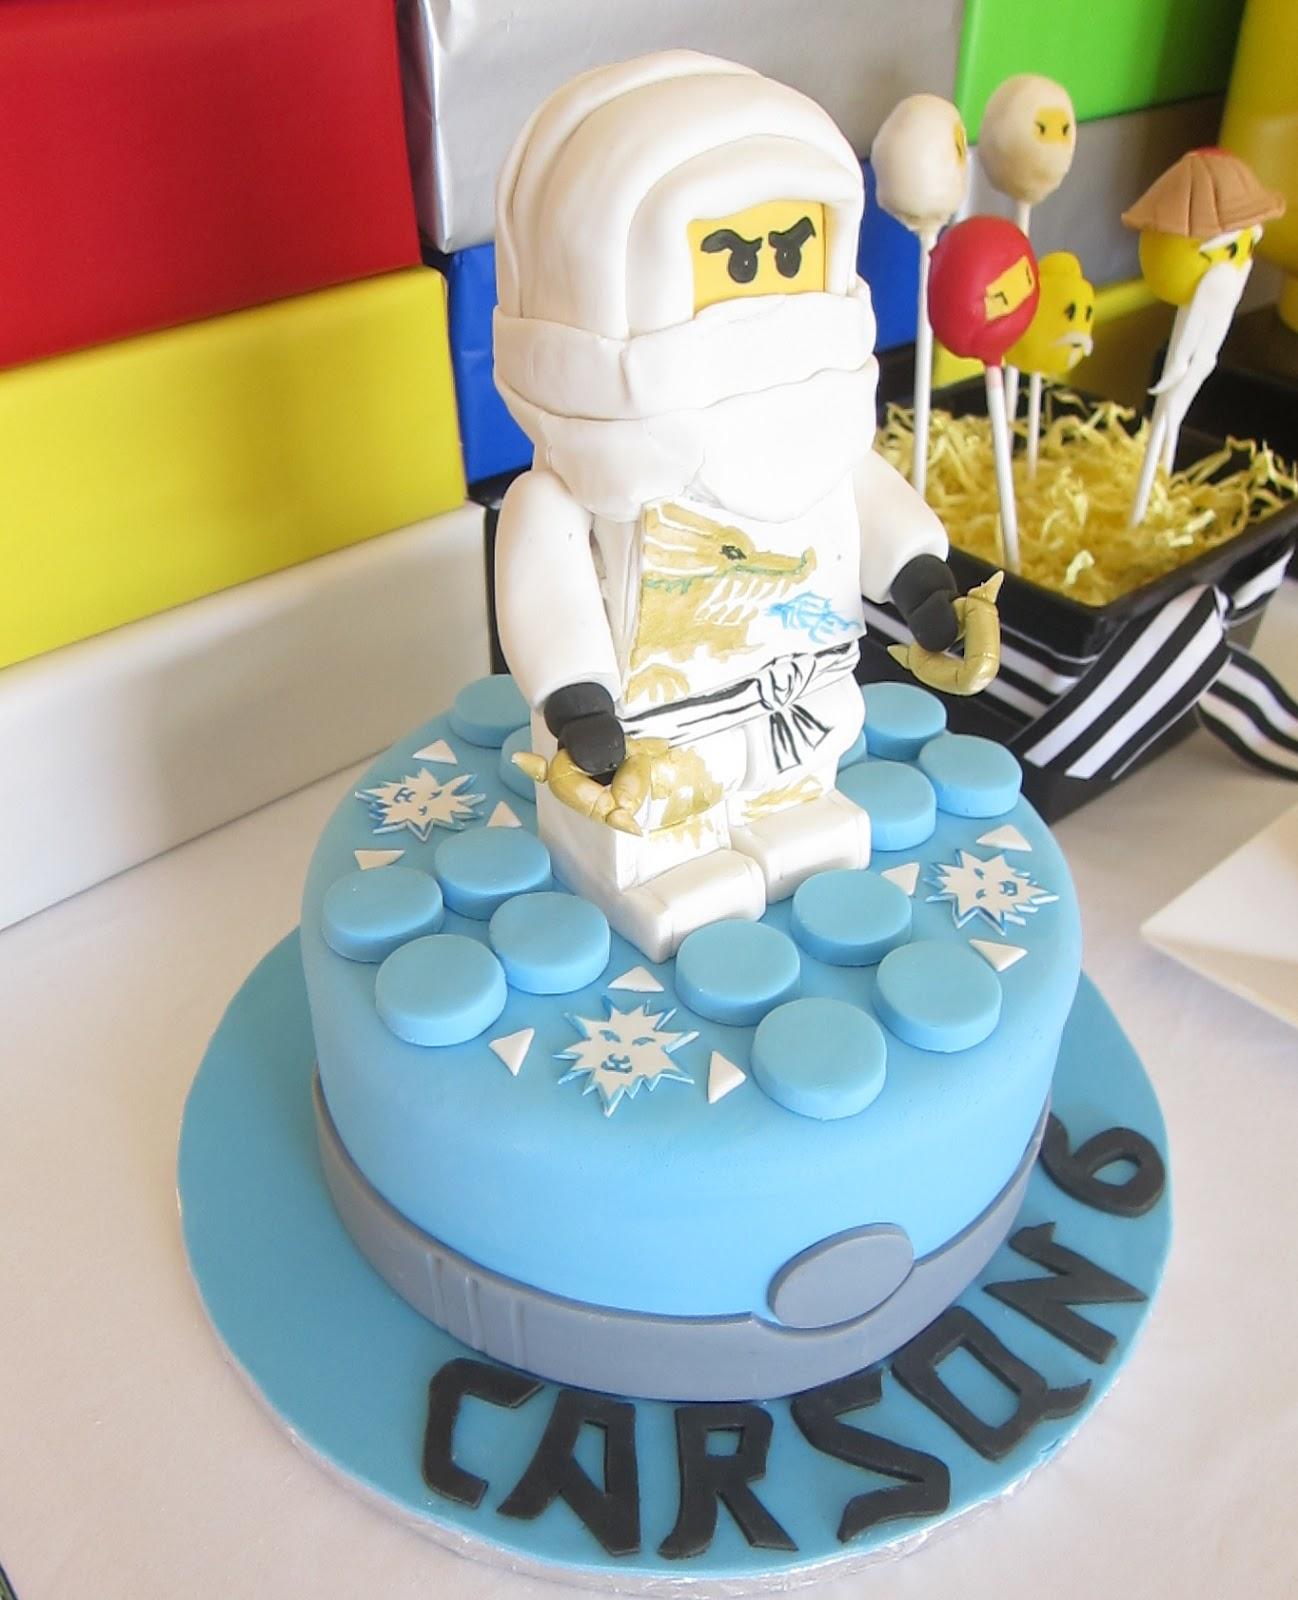 Simplyiced Party Details Lego Ninjago Birthday Party